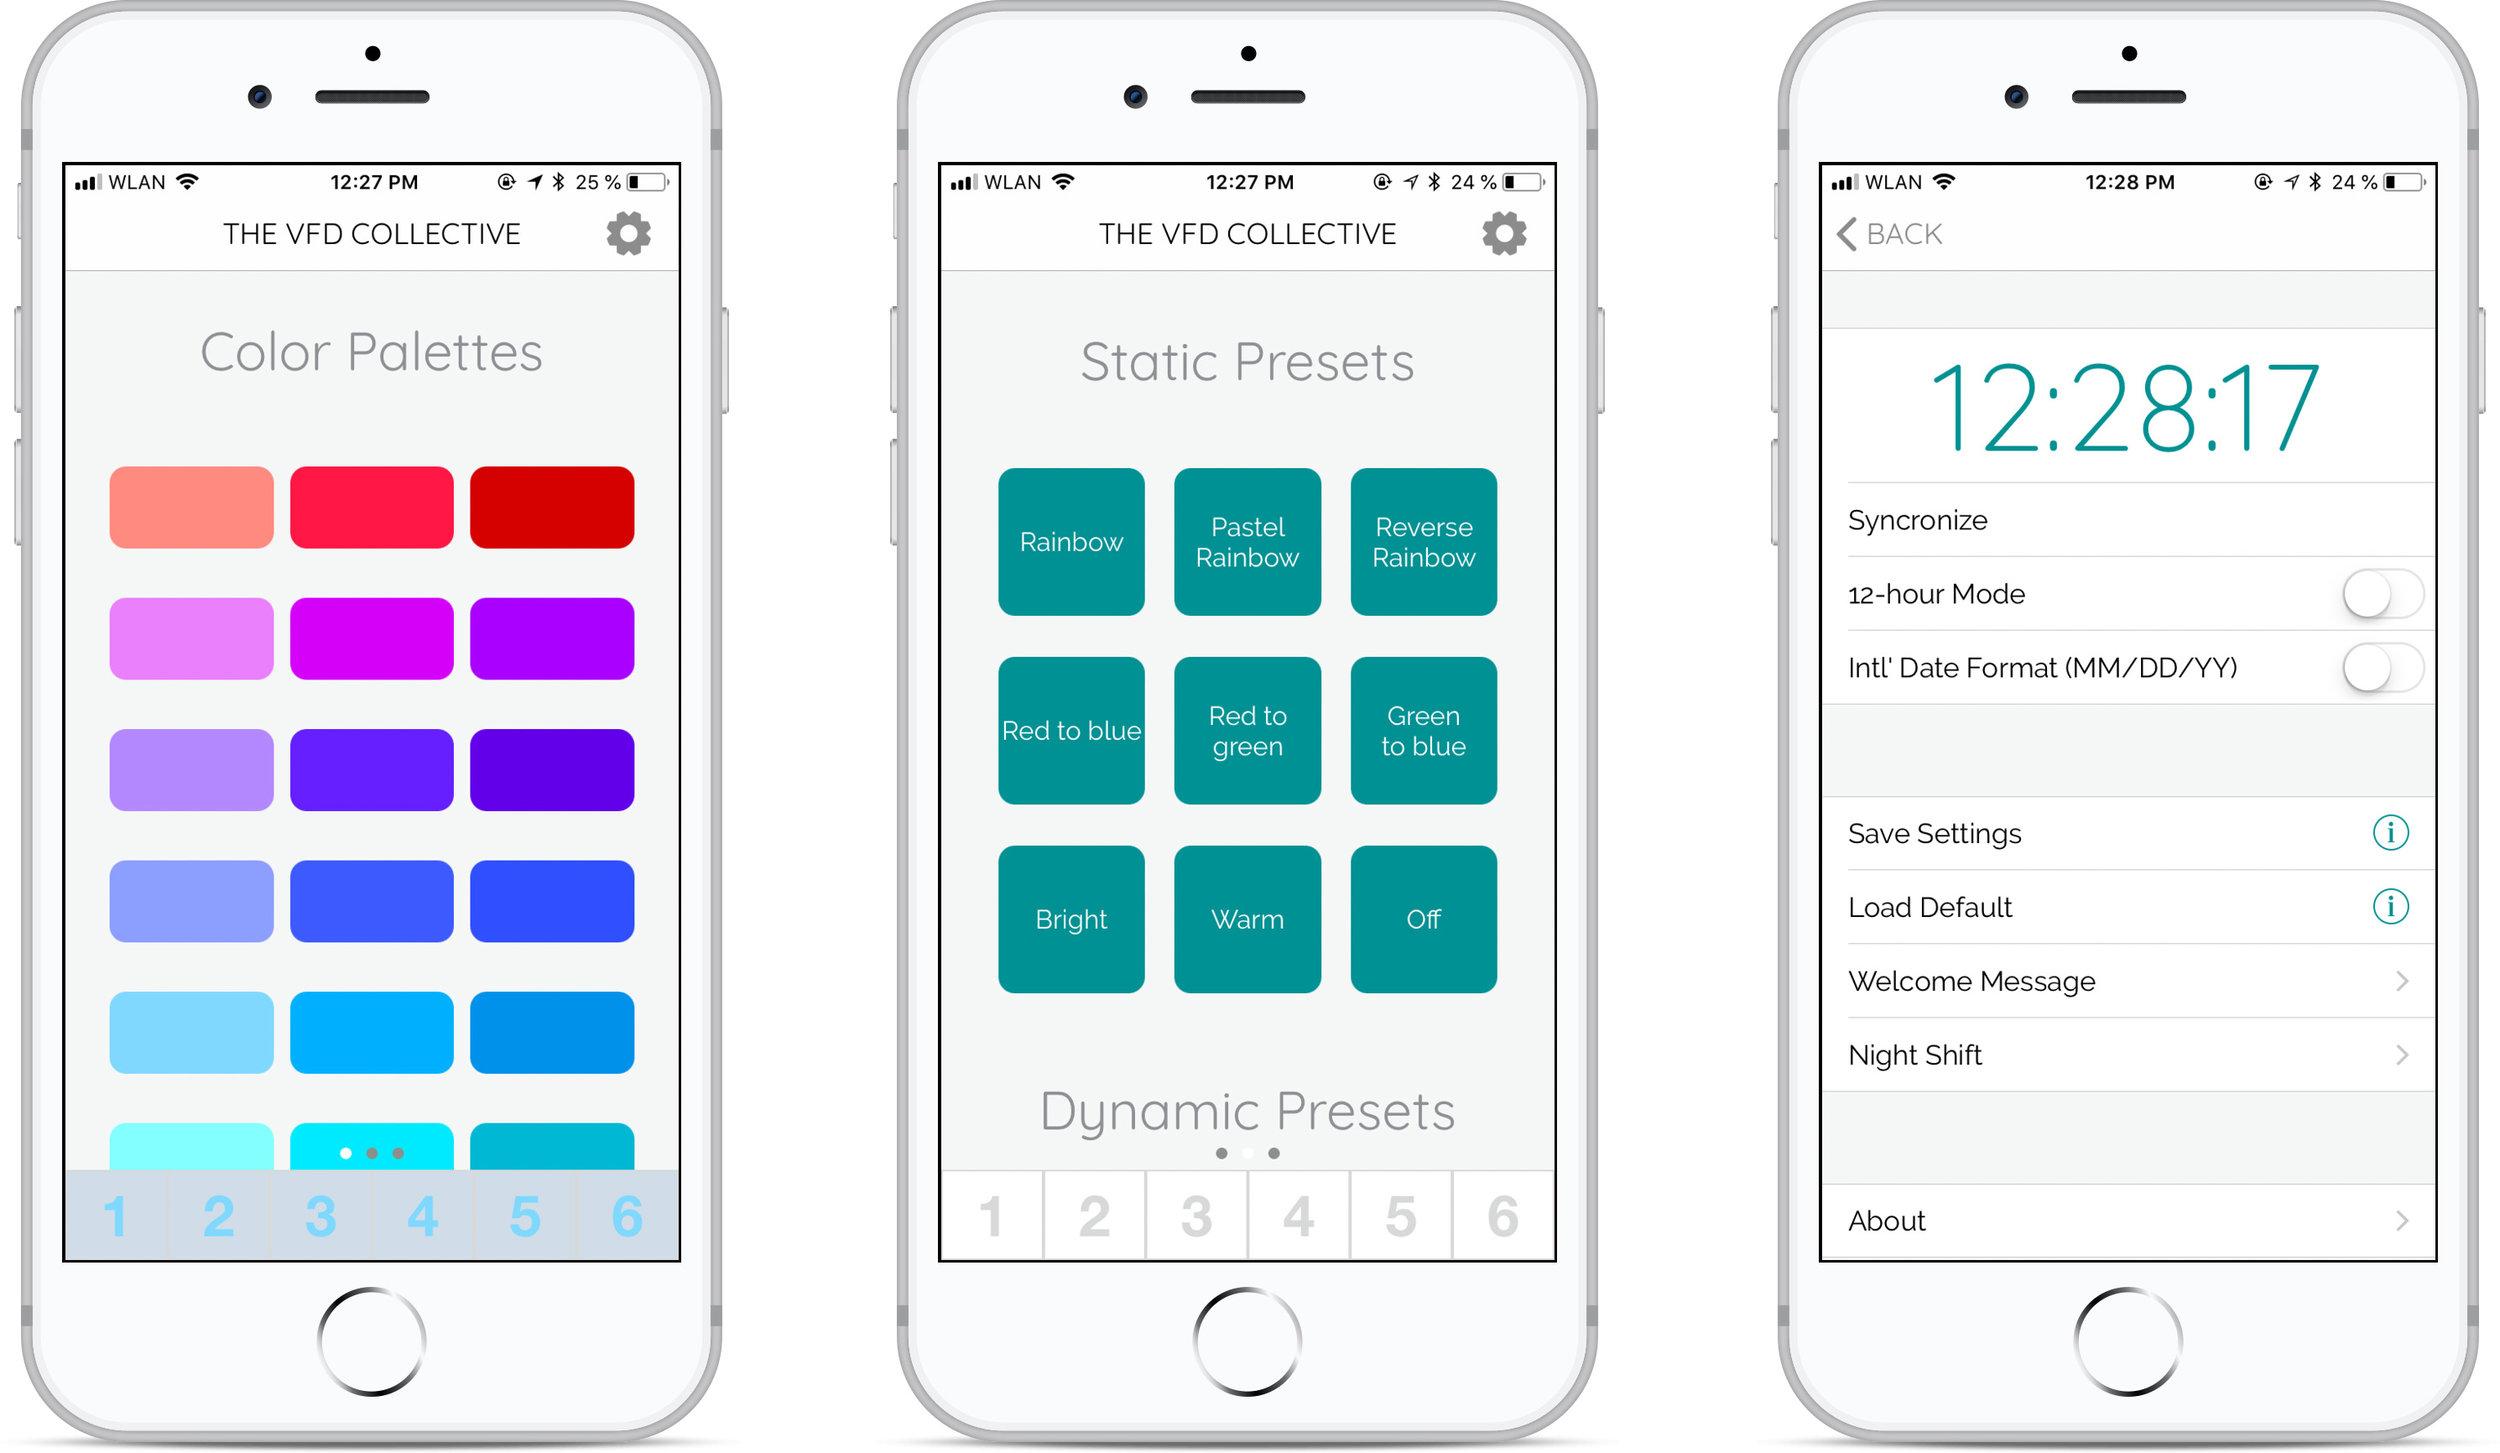 The Bluetooth iPhone App